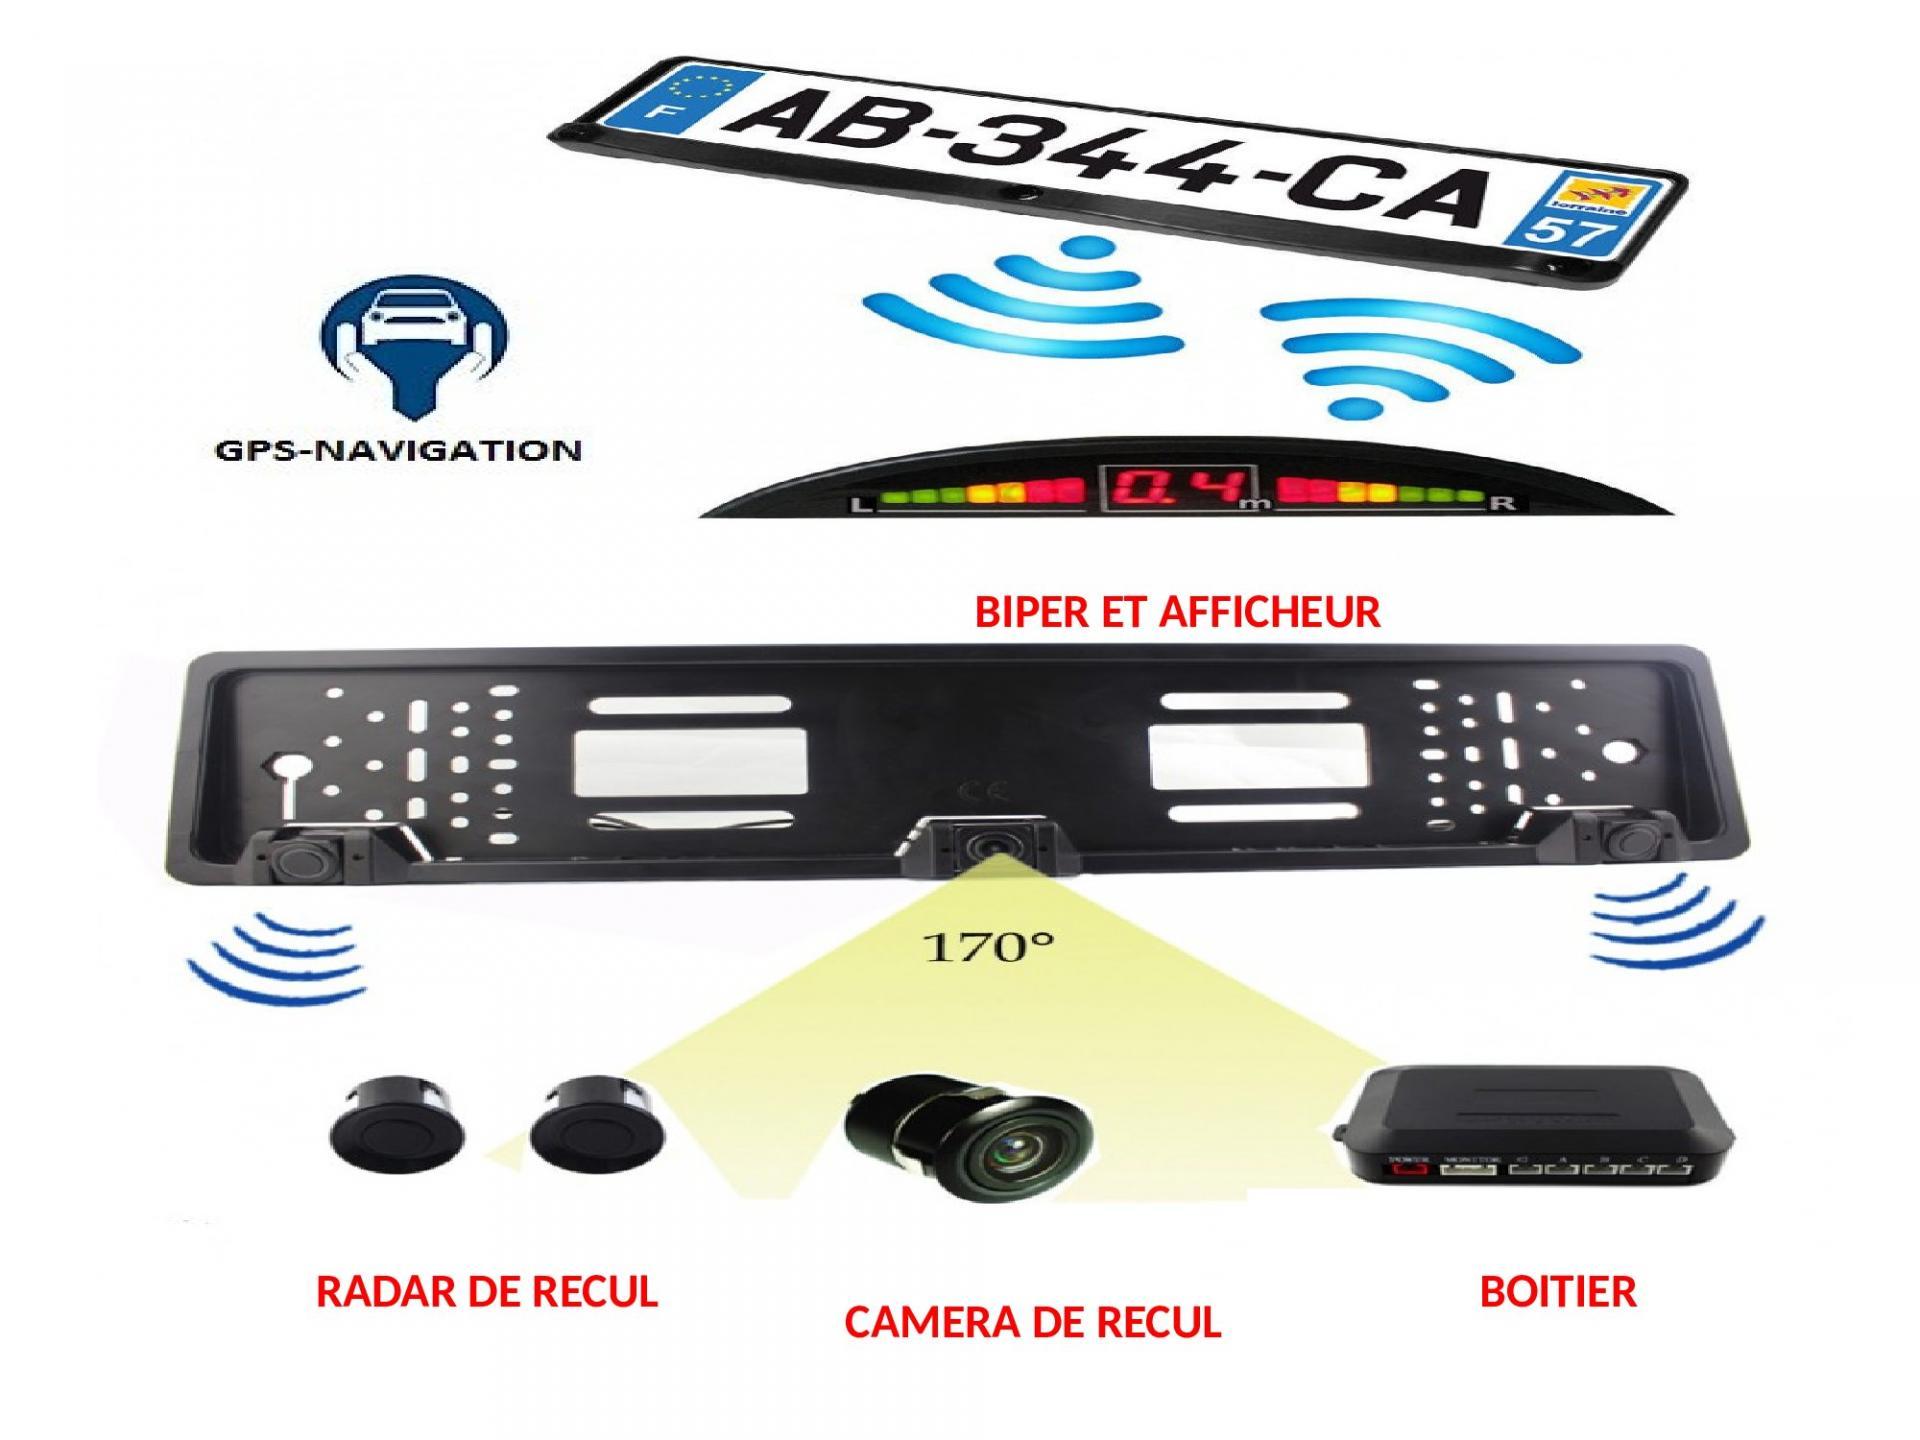 Sans fil wifi cadre de plaque d immatriculation camera de recul de recul radar de recul vision nocture 2 1